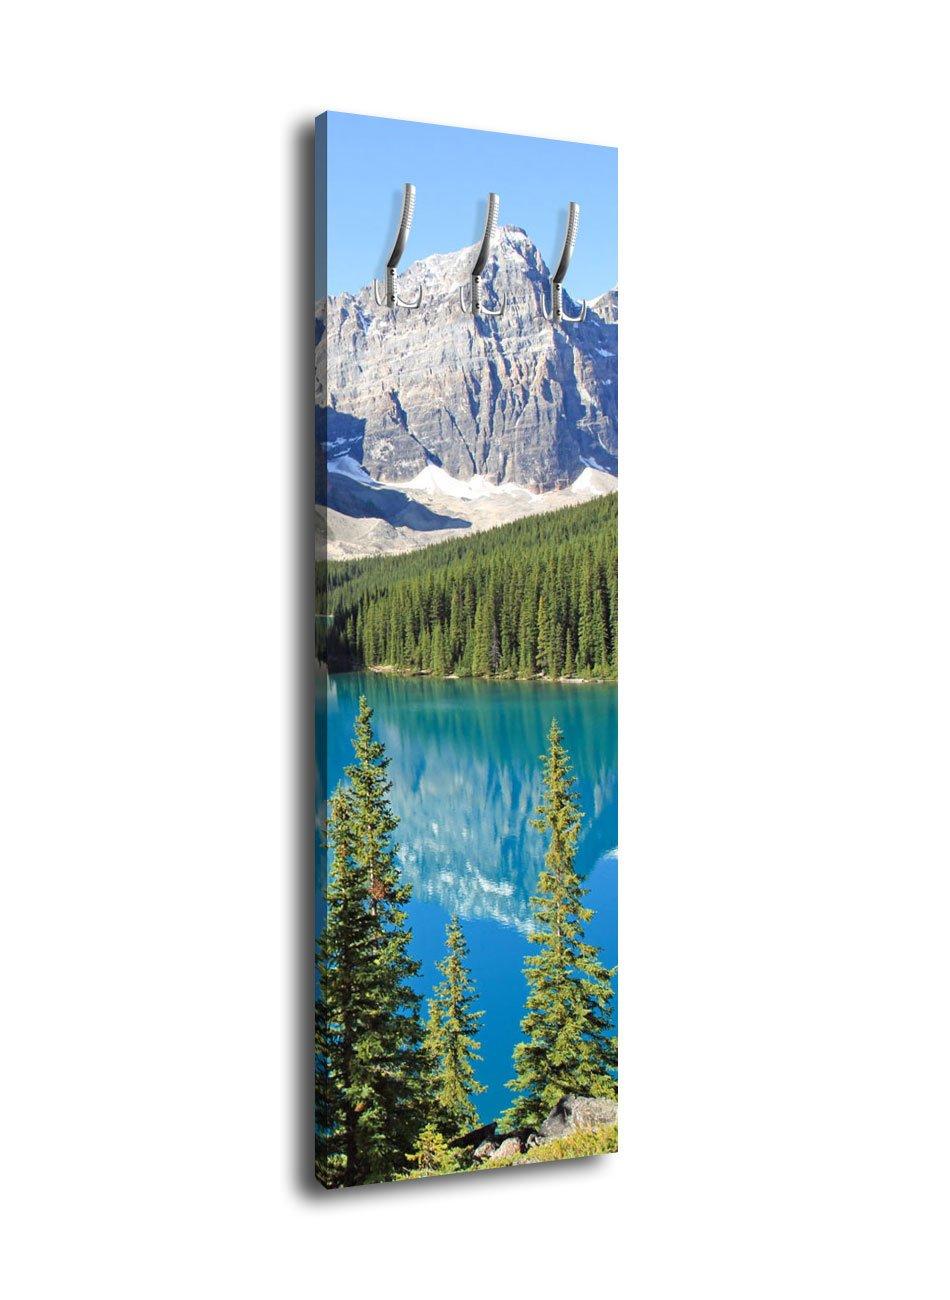 Wandmotiv24 Garderobe mit Design Moraine Lake Kanada G149 40x125cm Wandgarderobe See Blau Natur